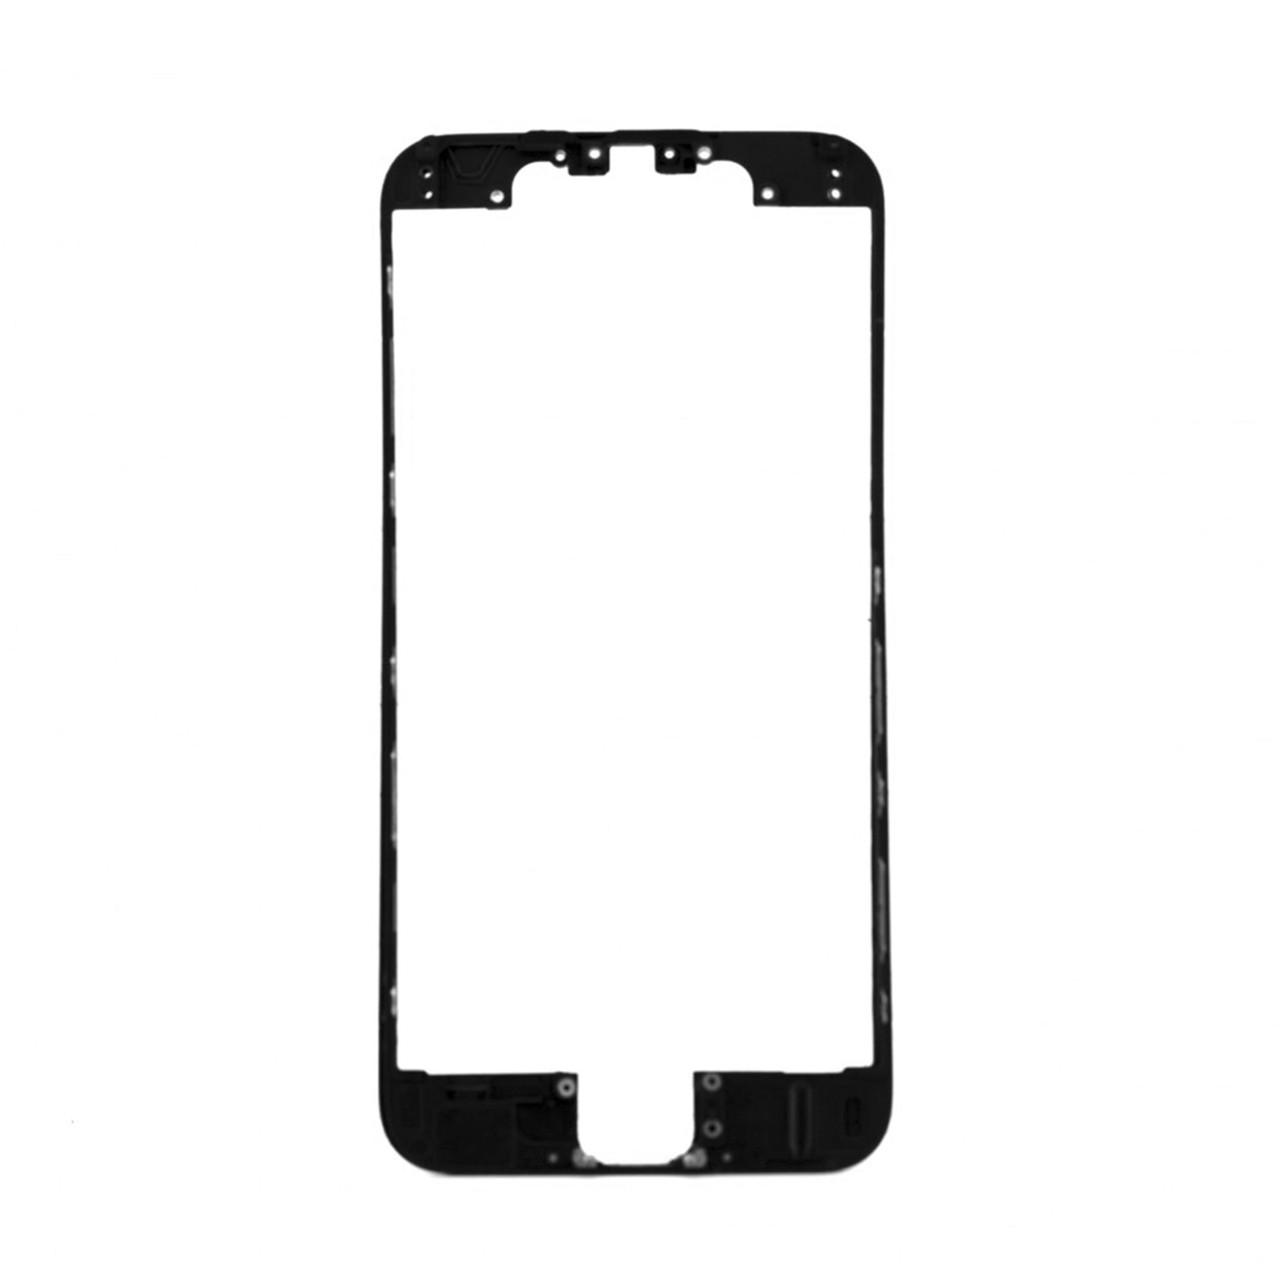 Рамка для дисплея Apple iPhone 6G AAA внутренняя пустая Black (5)